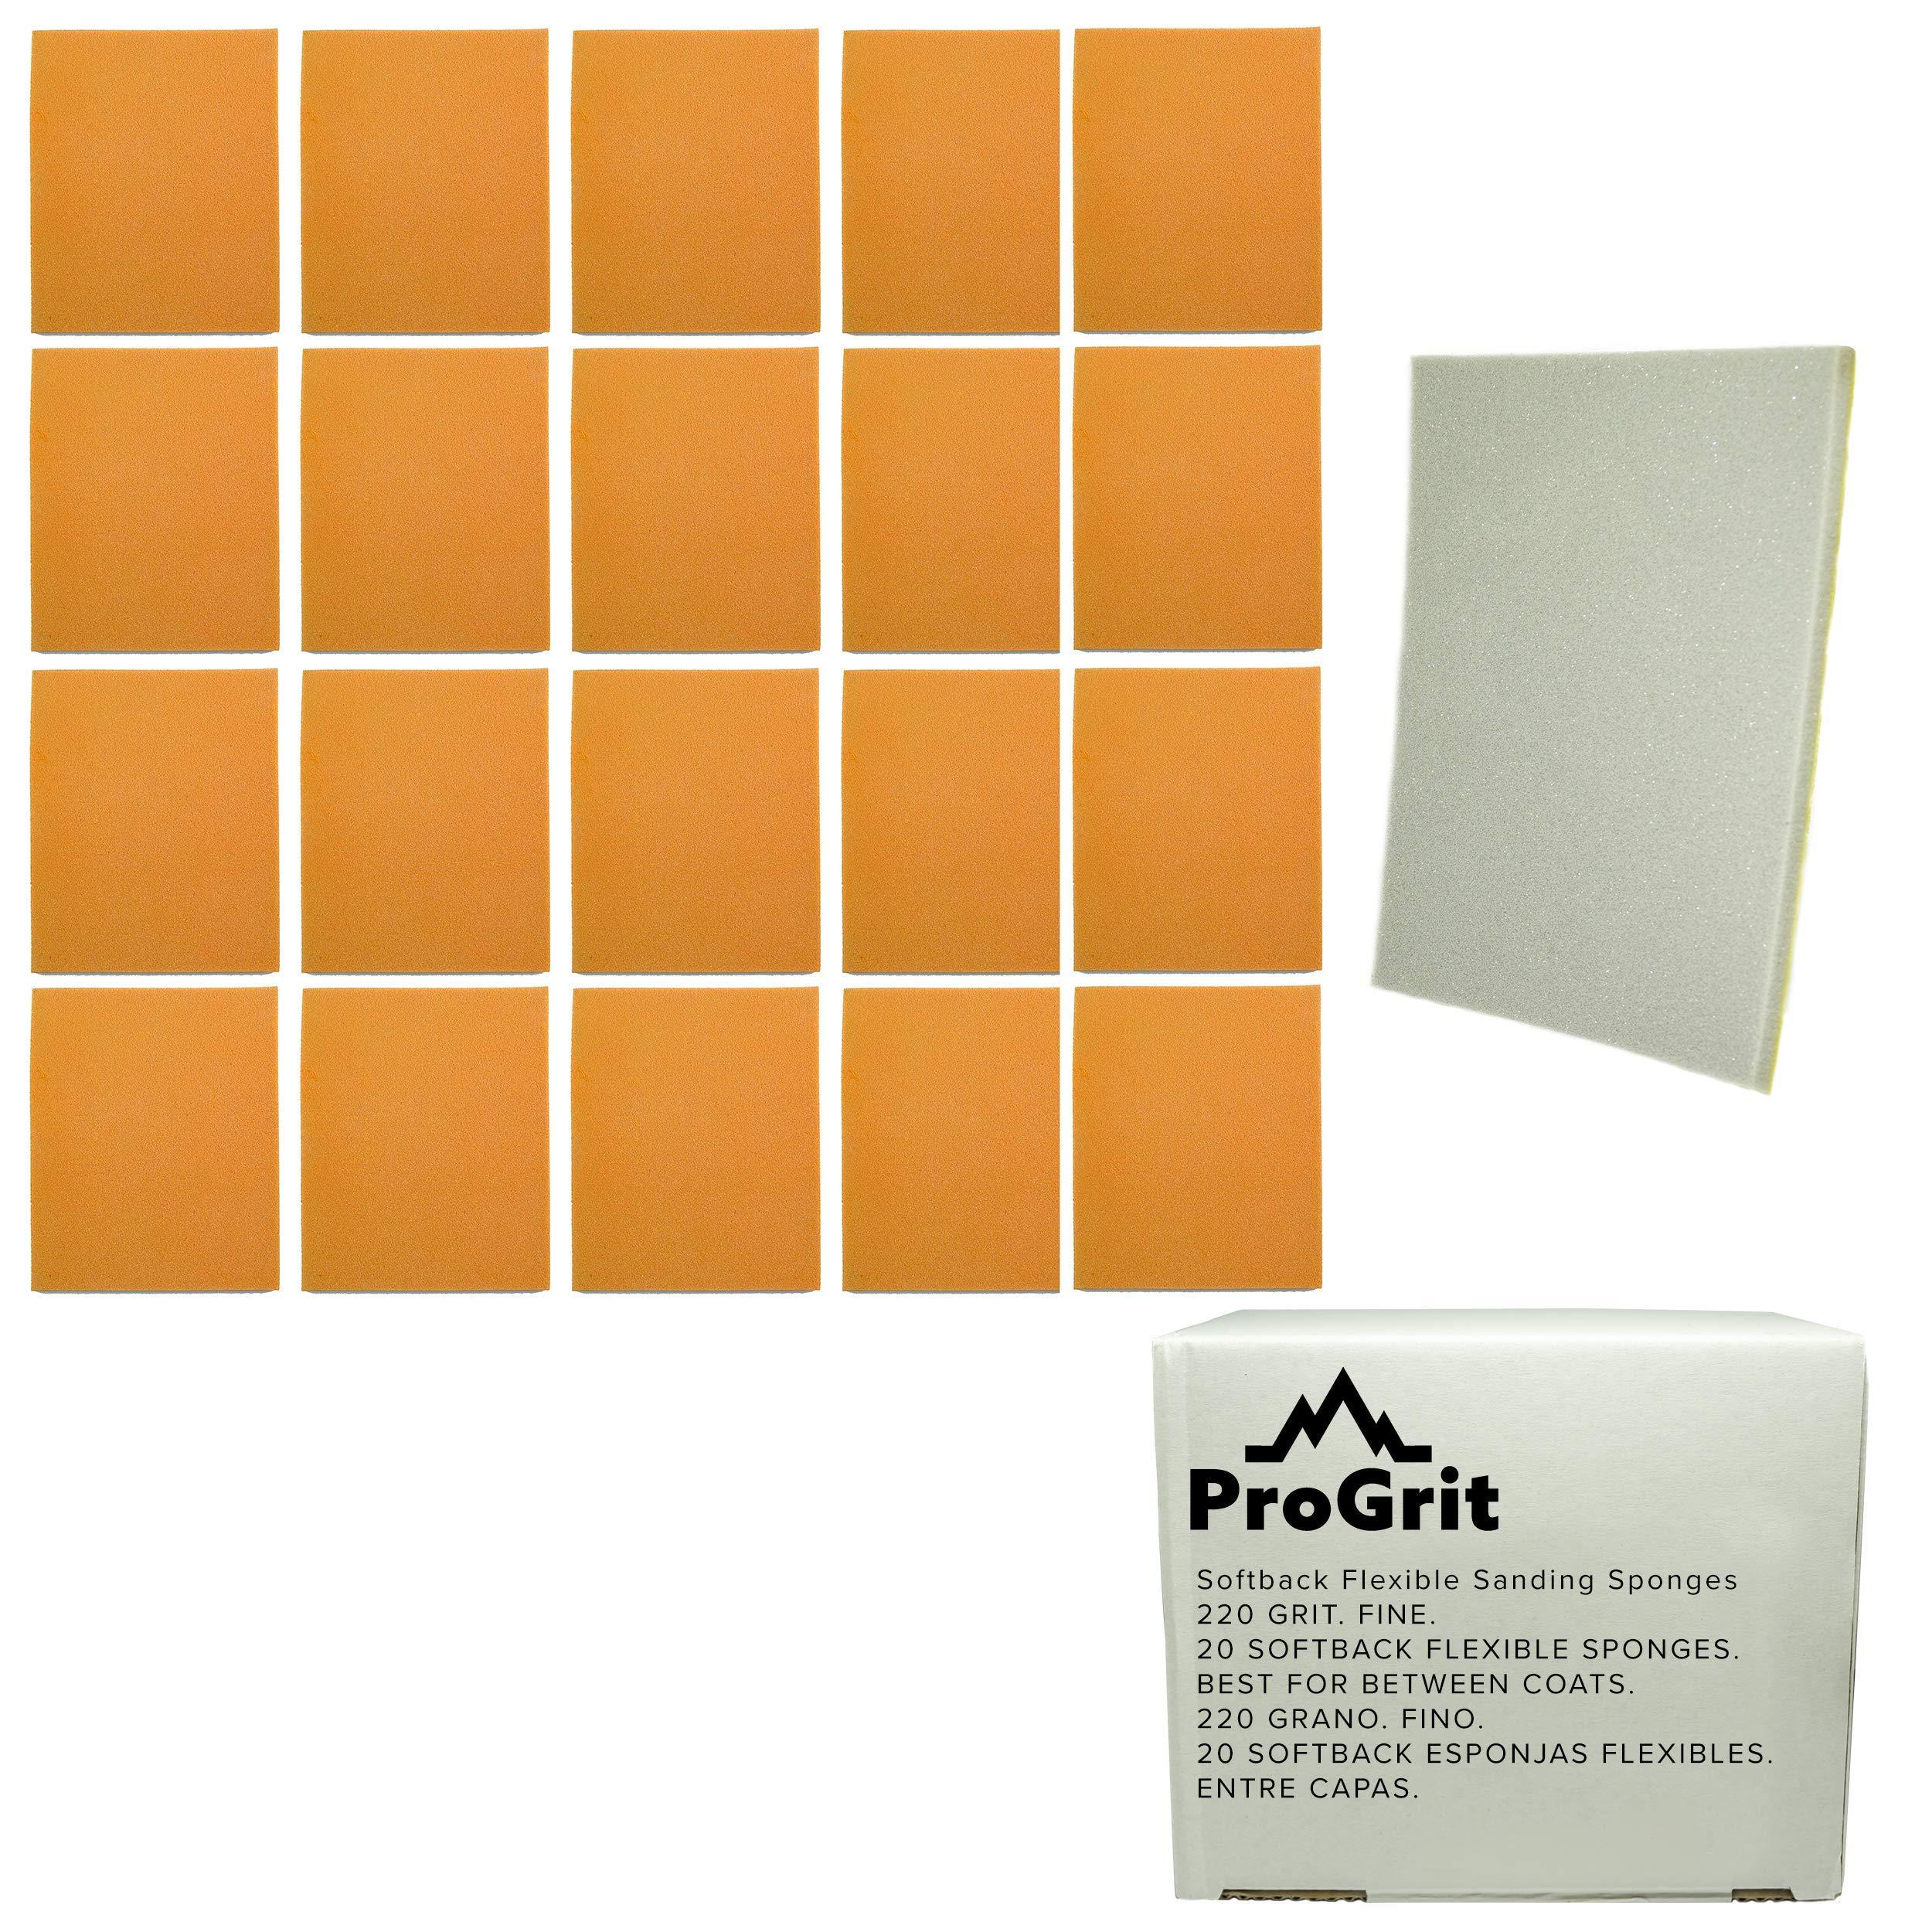 20 Pack ProGrit Sanding Sponges 220 Medium Grit for Between Coats Hand Sander Pads Flexible Softback Wet or Dry Bulk Pack by Home and Kitchen World